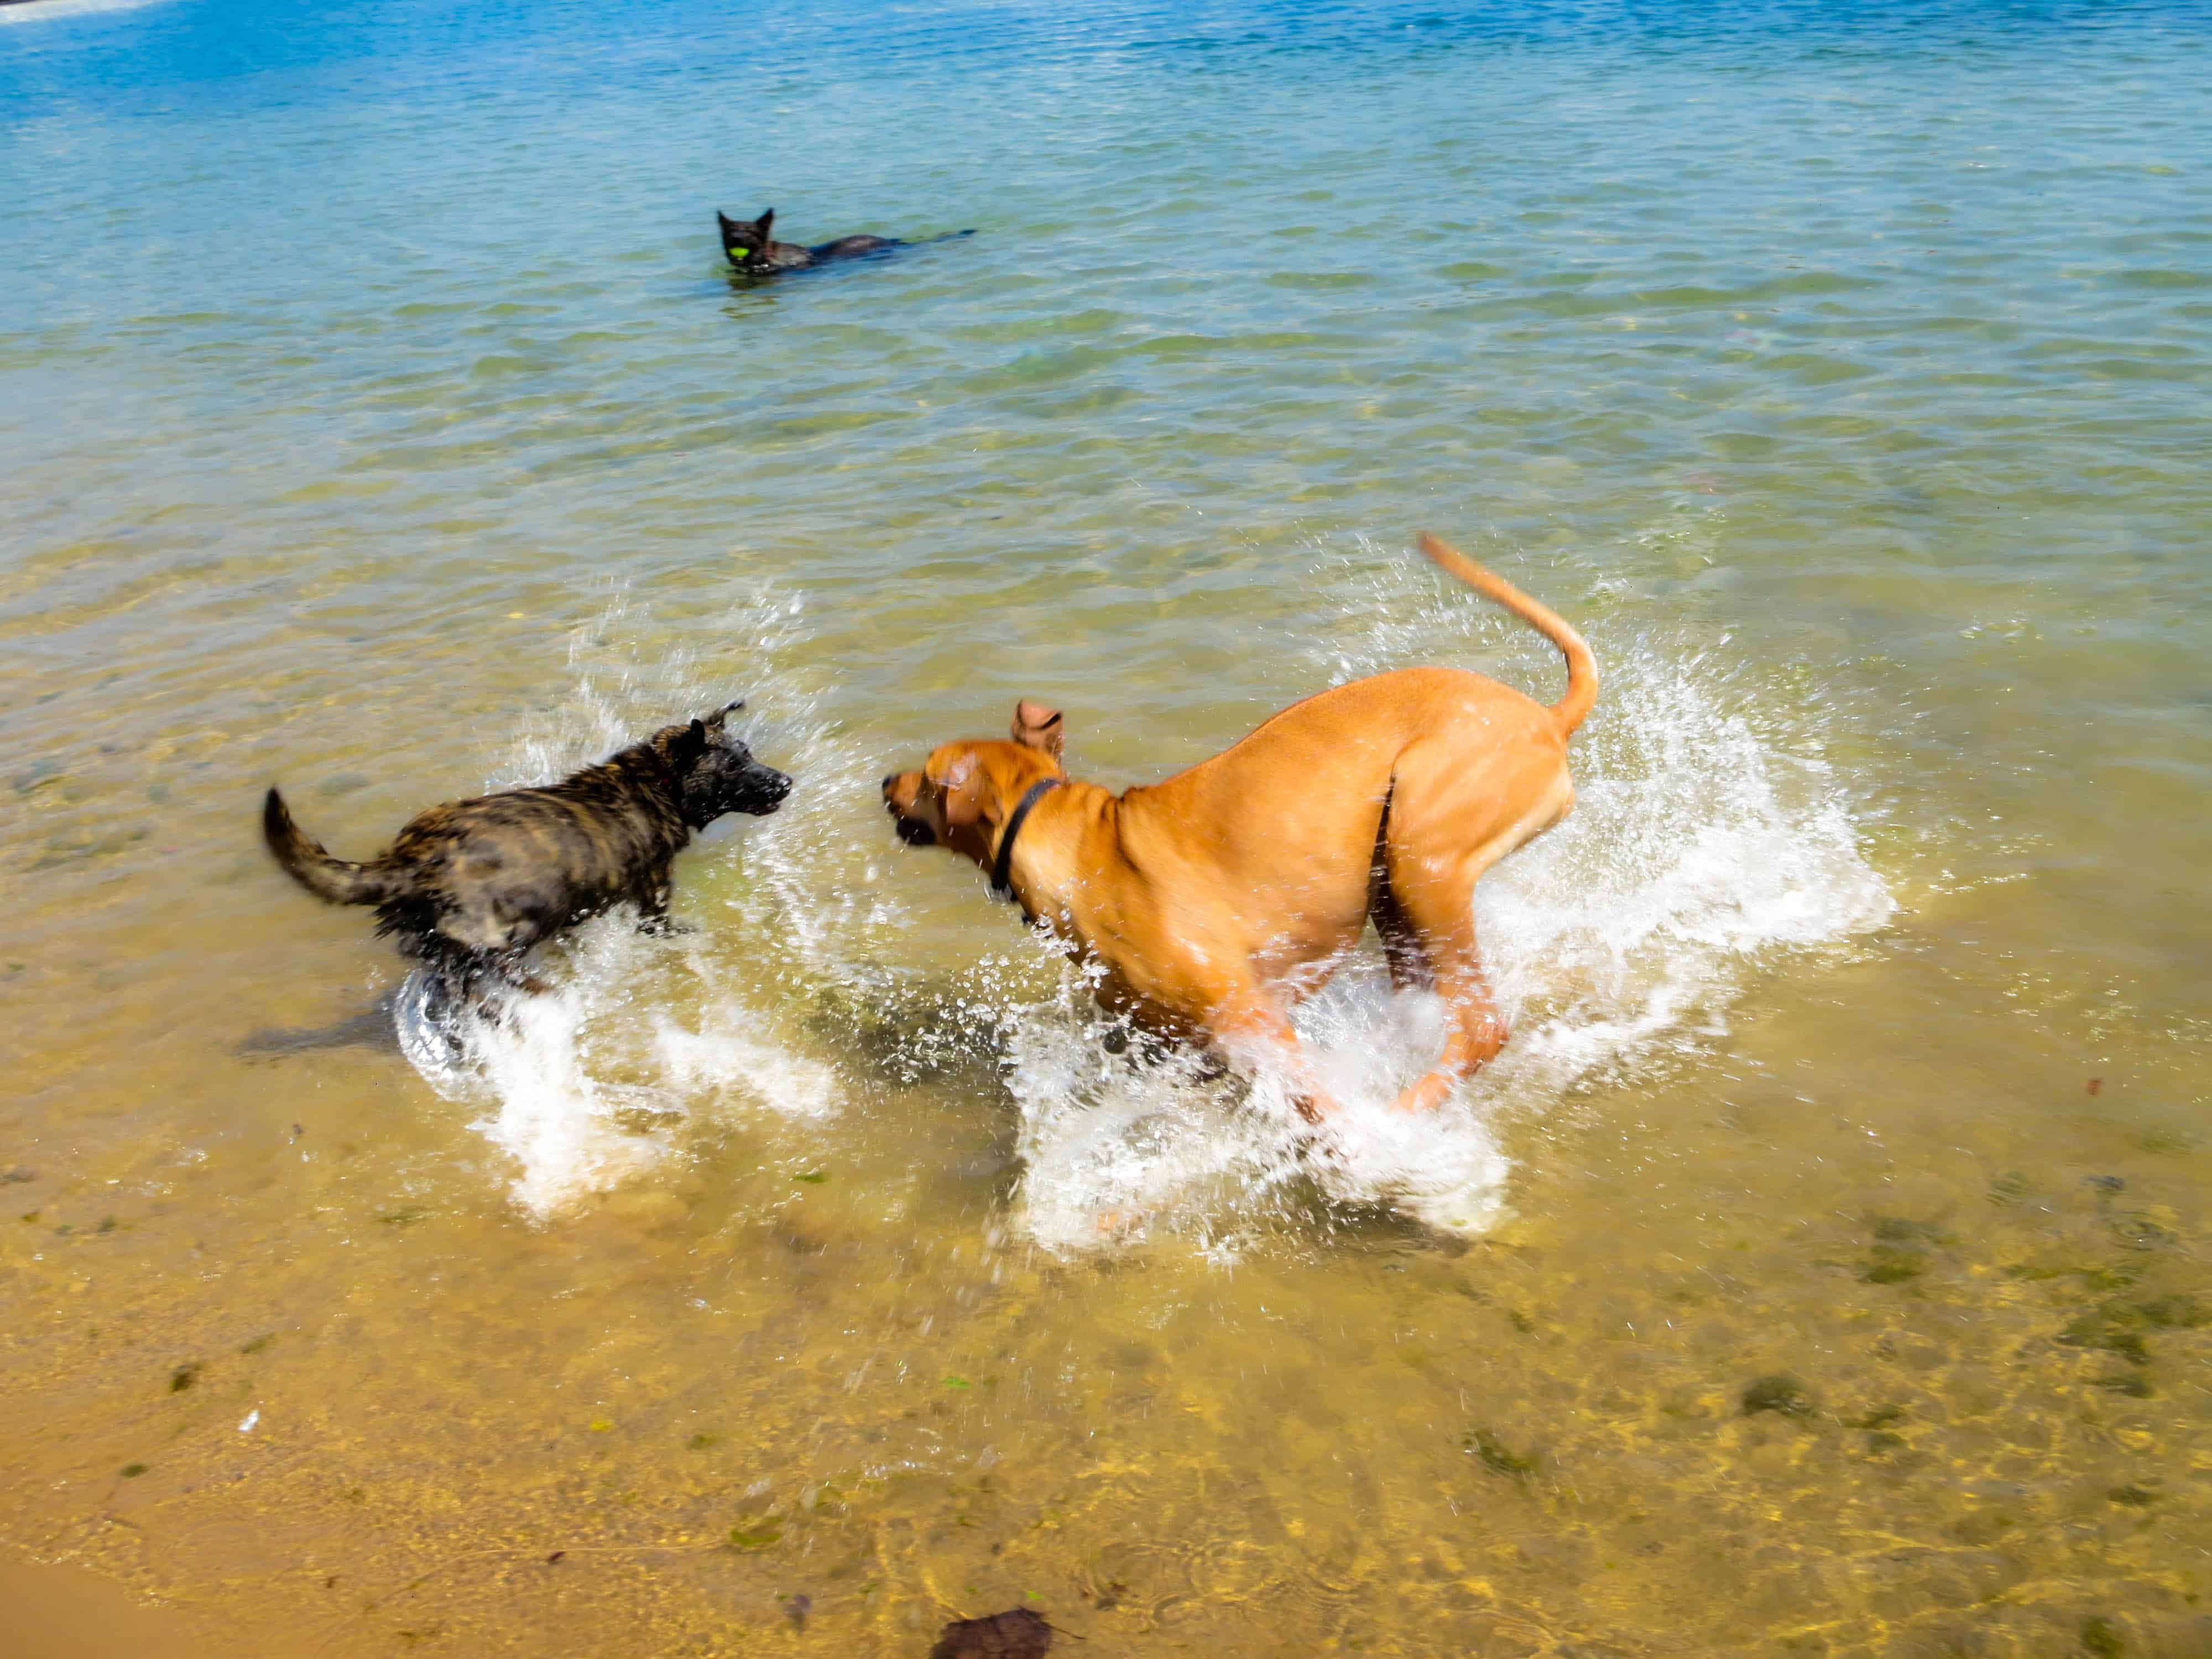 Rhodesian Ridgeback, dog adventure, petcentric, marking our territory, dog blog, dog photos